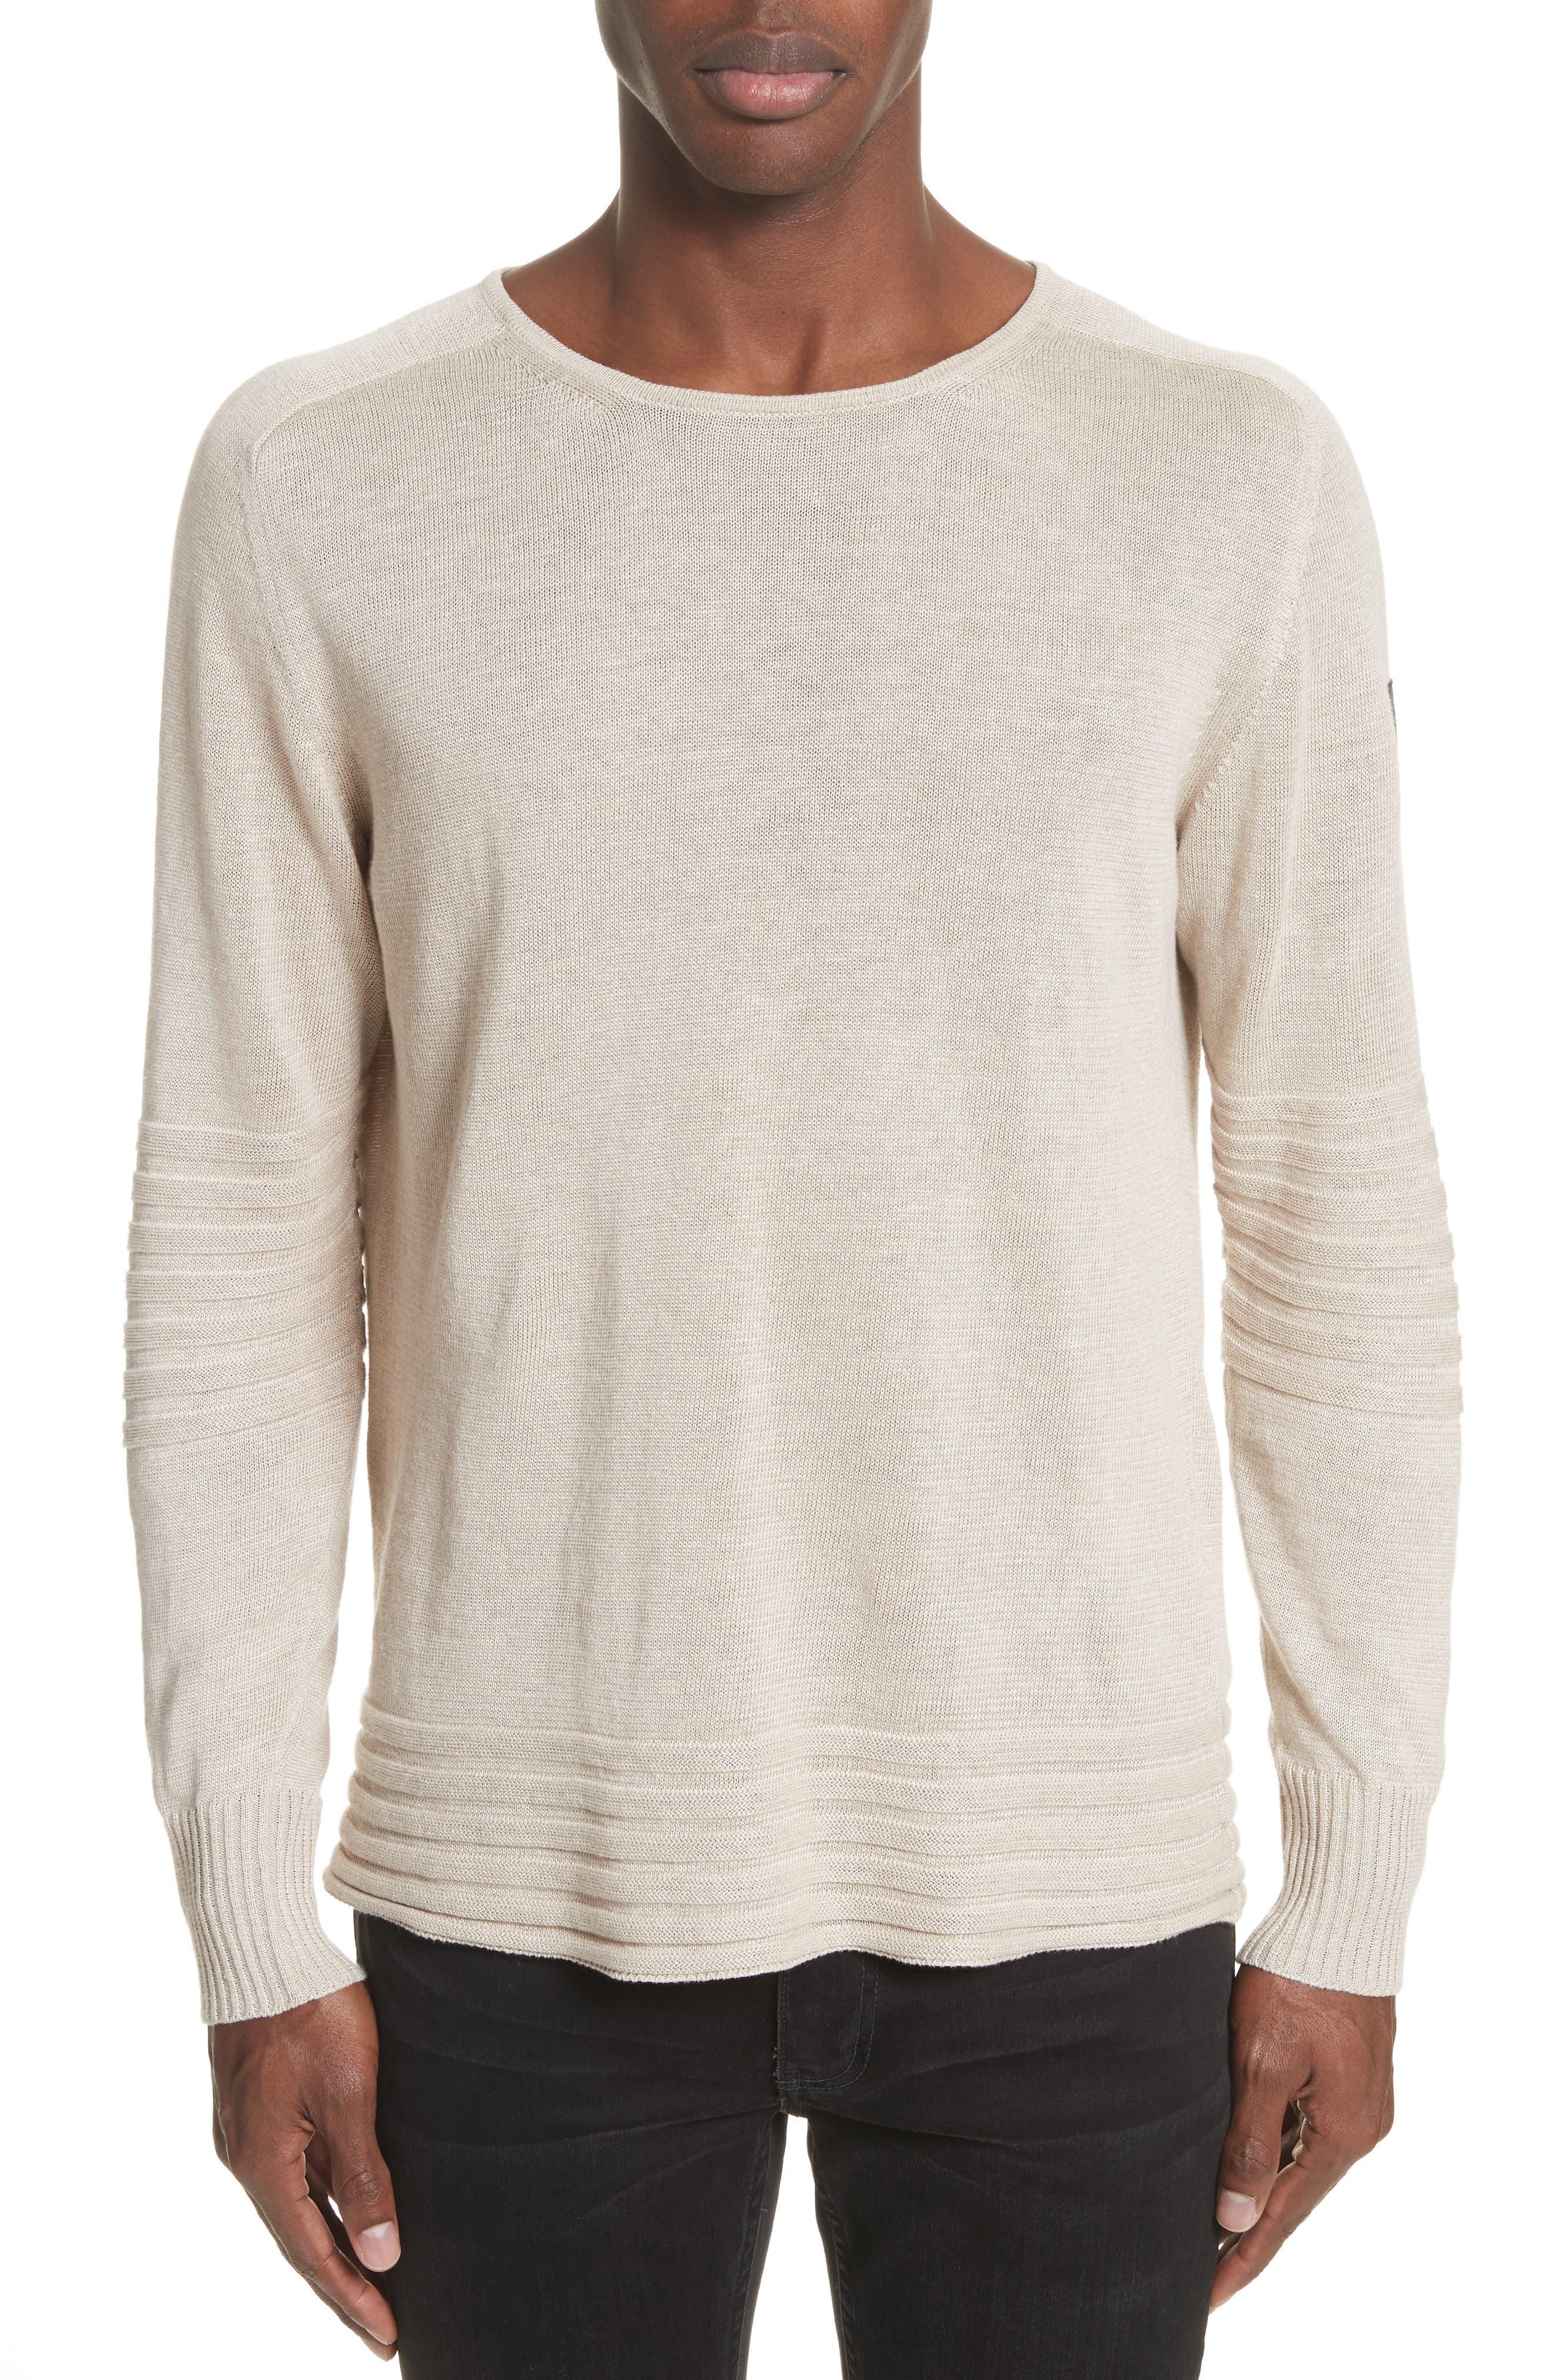 Exford Linen Crewneck Sweater,                             Main thumbnail 1, color,                             Light Sand